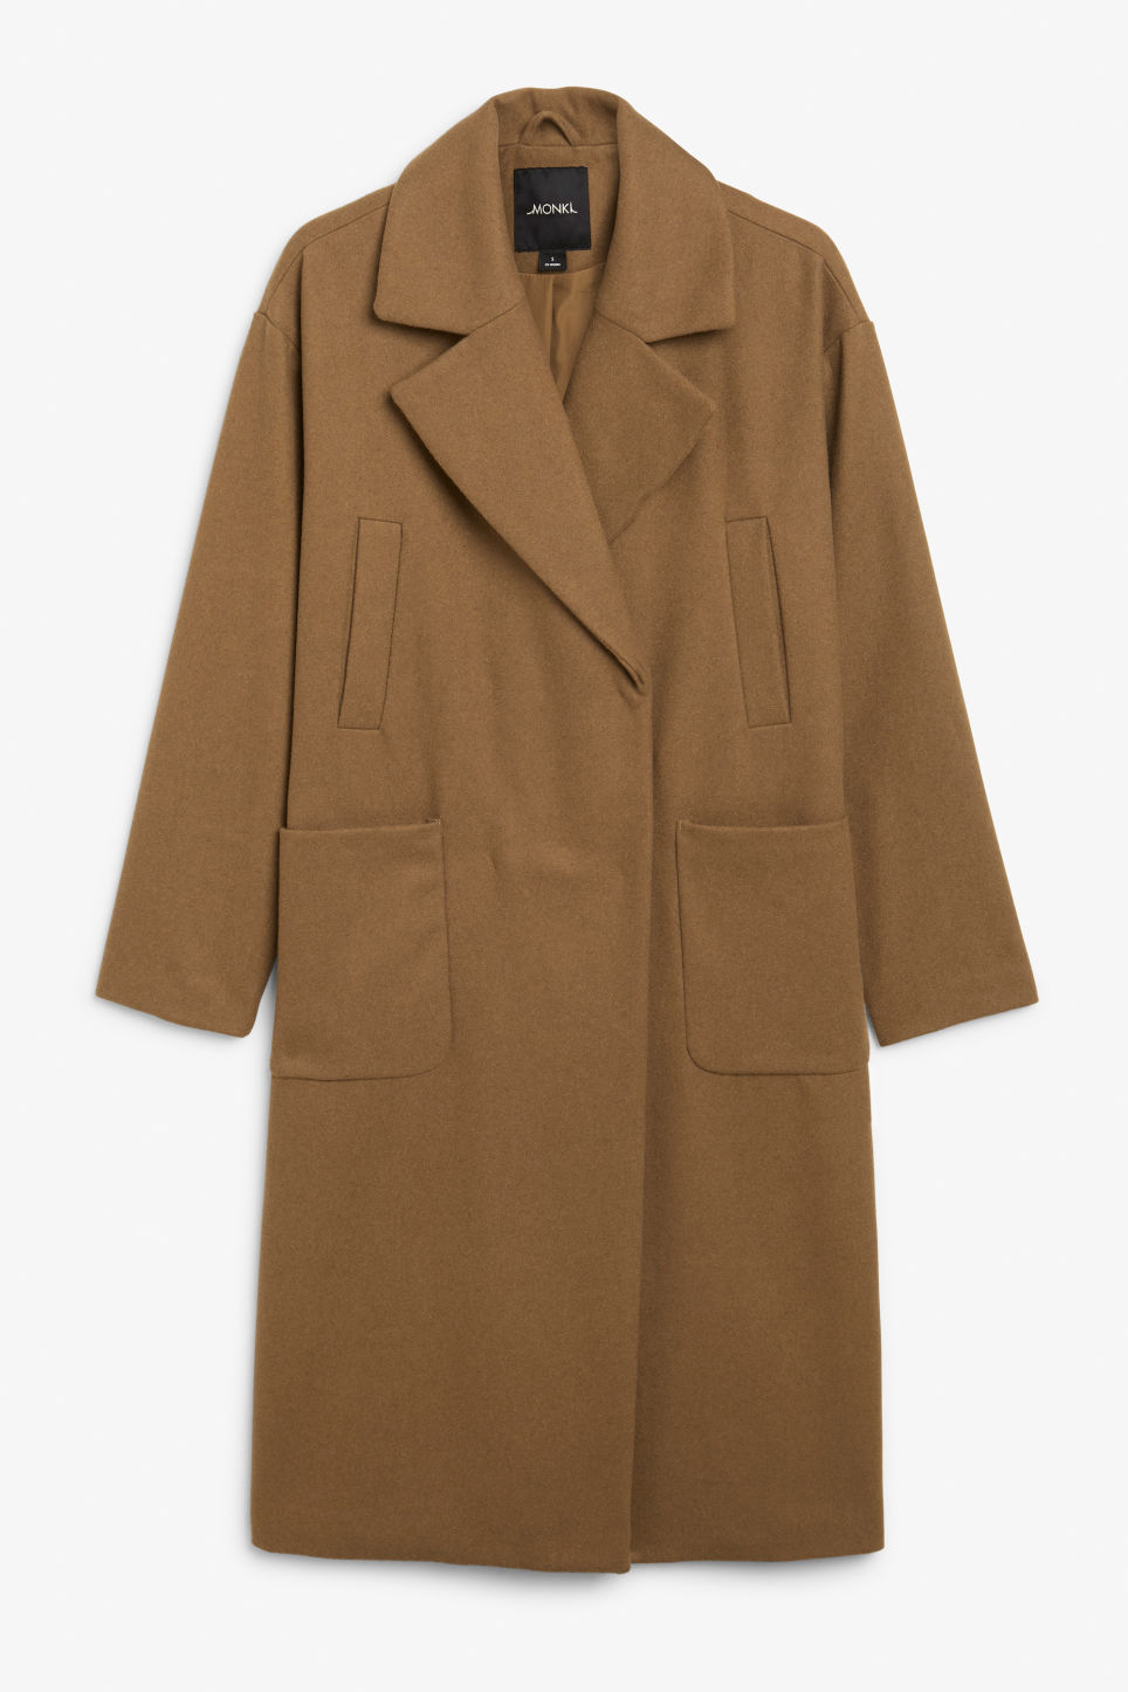 536bb094a0 Double-breasted wool coat - Black magic - Coats   Jackets - Monki